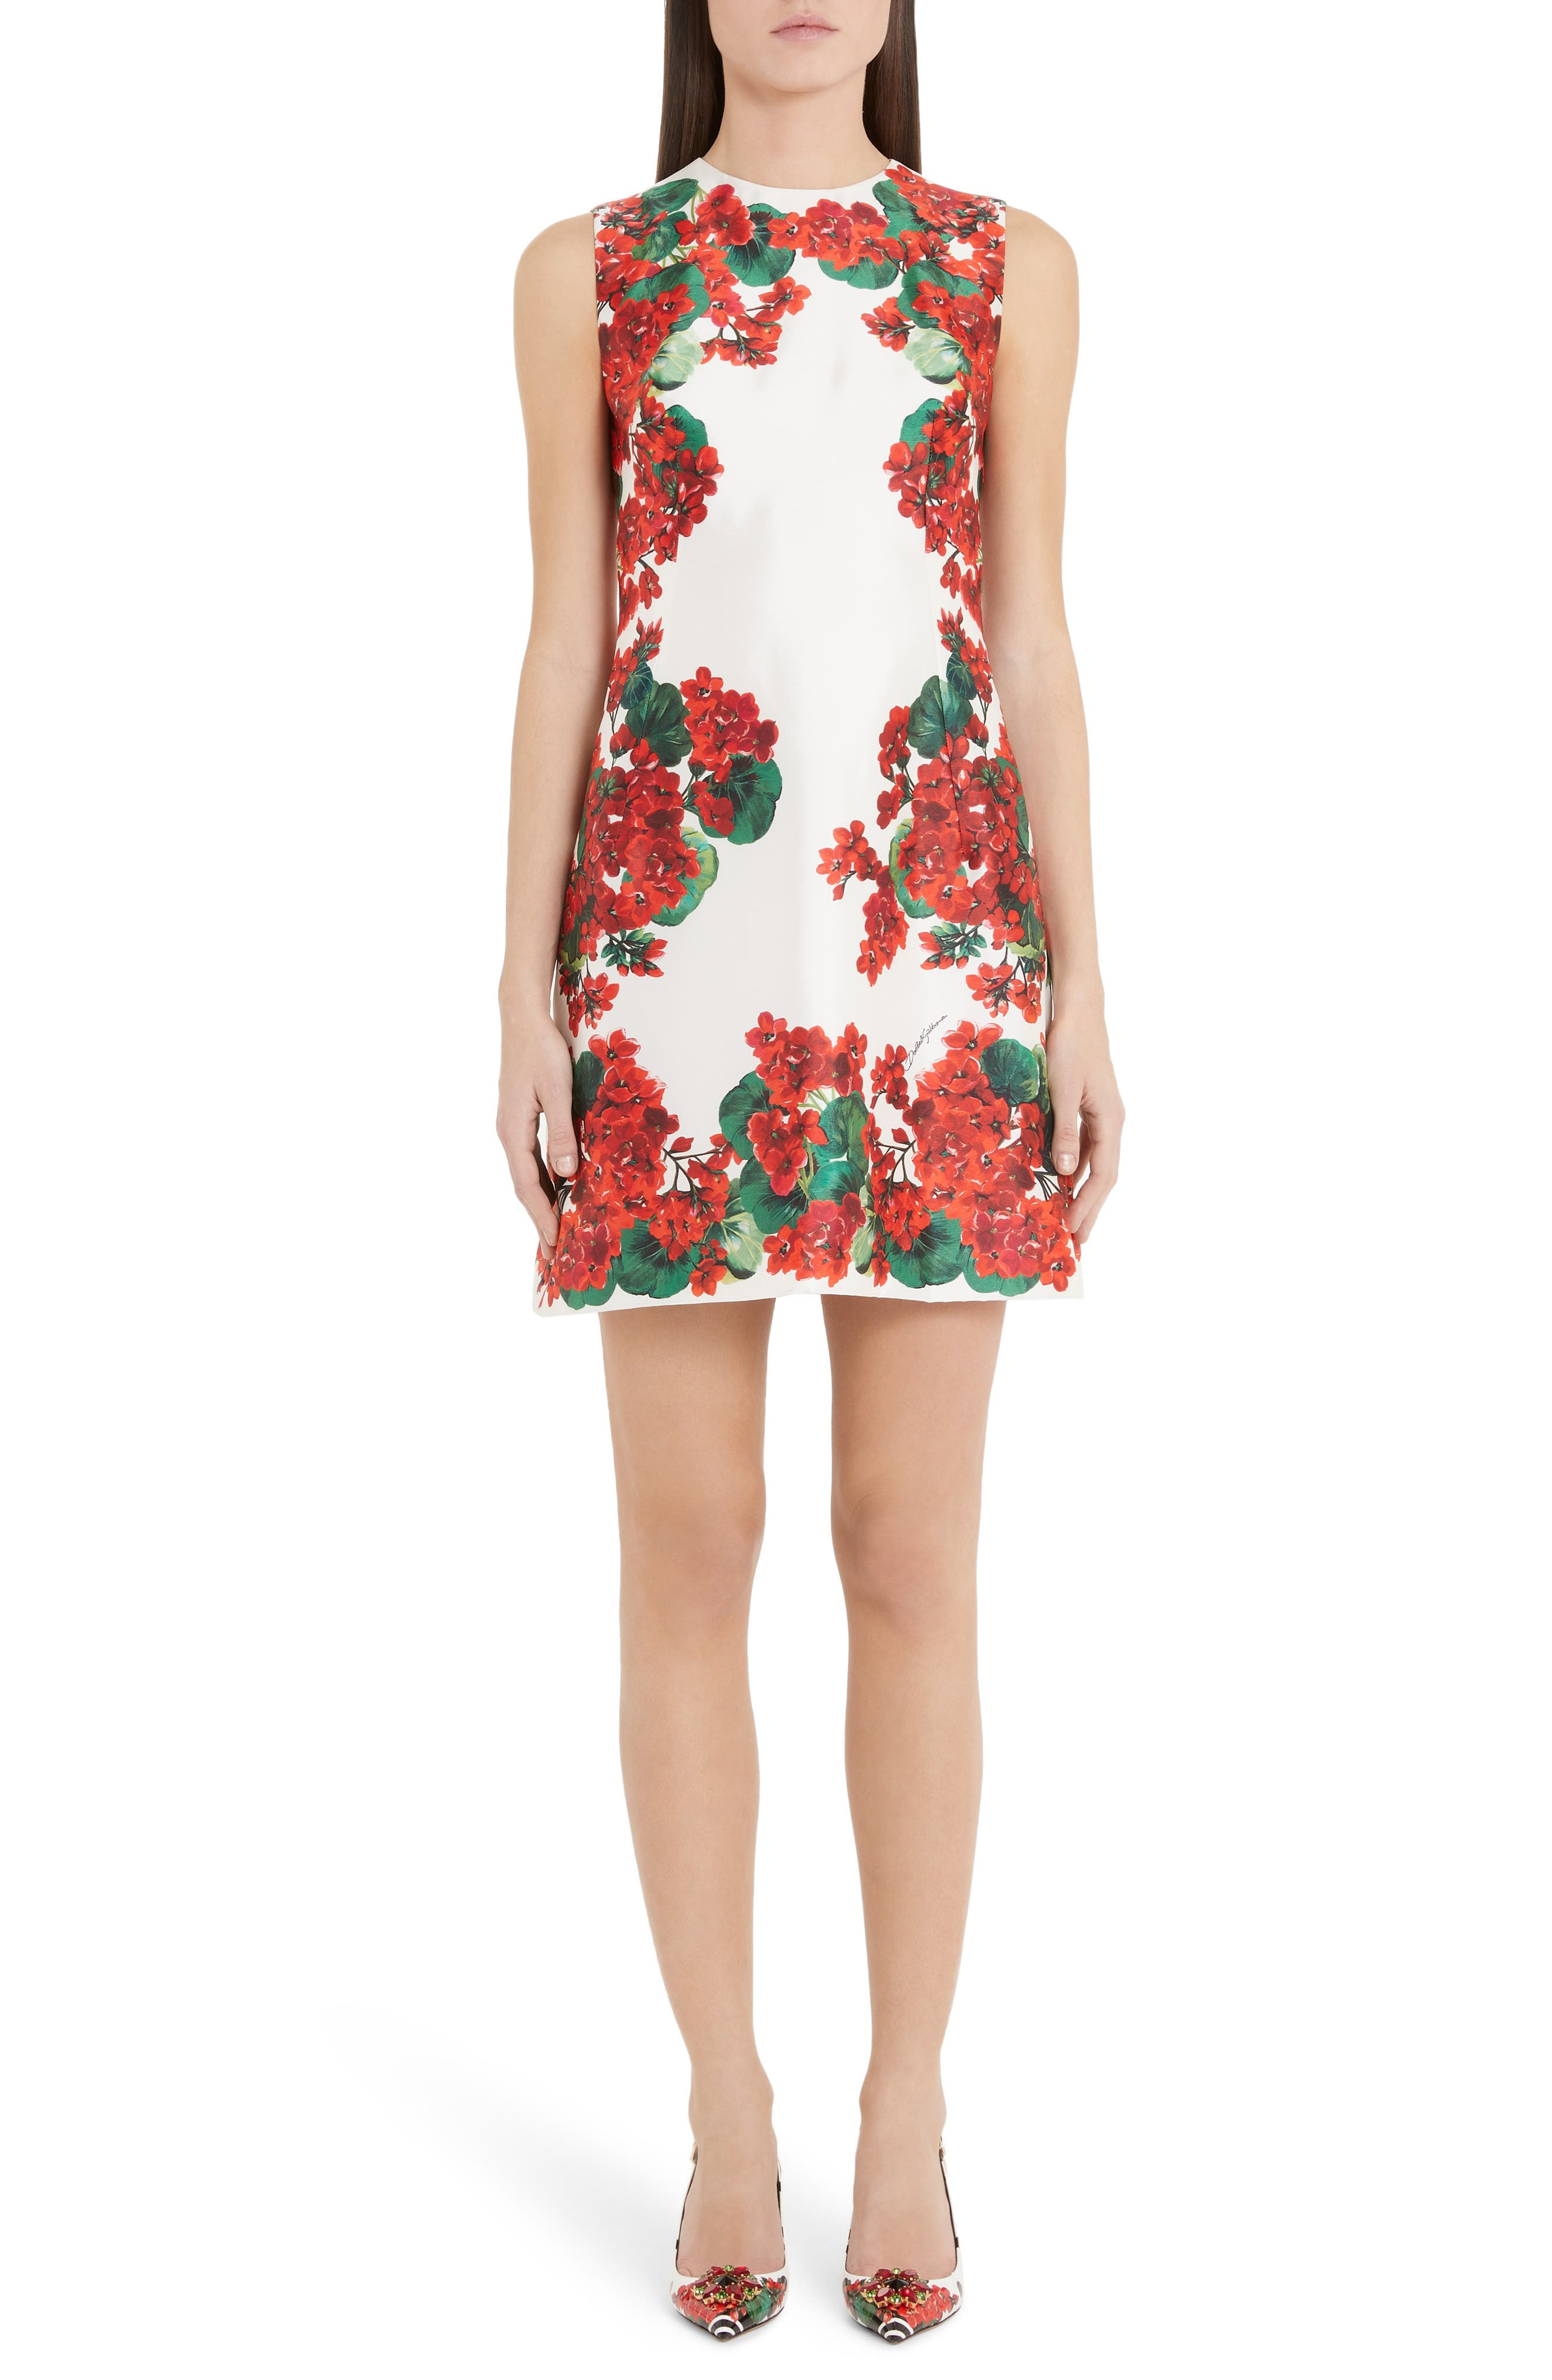 Dolce & gabbana Geranium Print A-Line Silk Minidress, 8 IT - Red